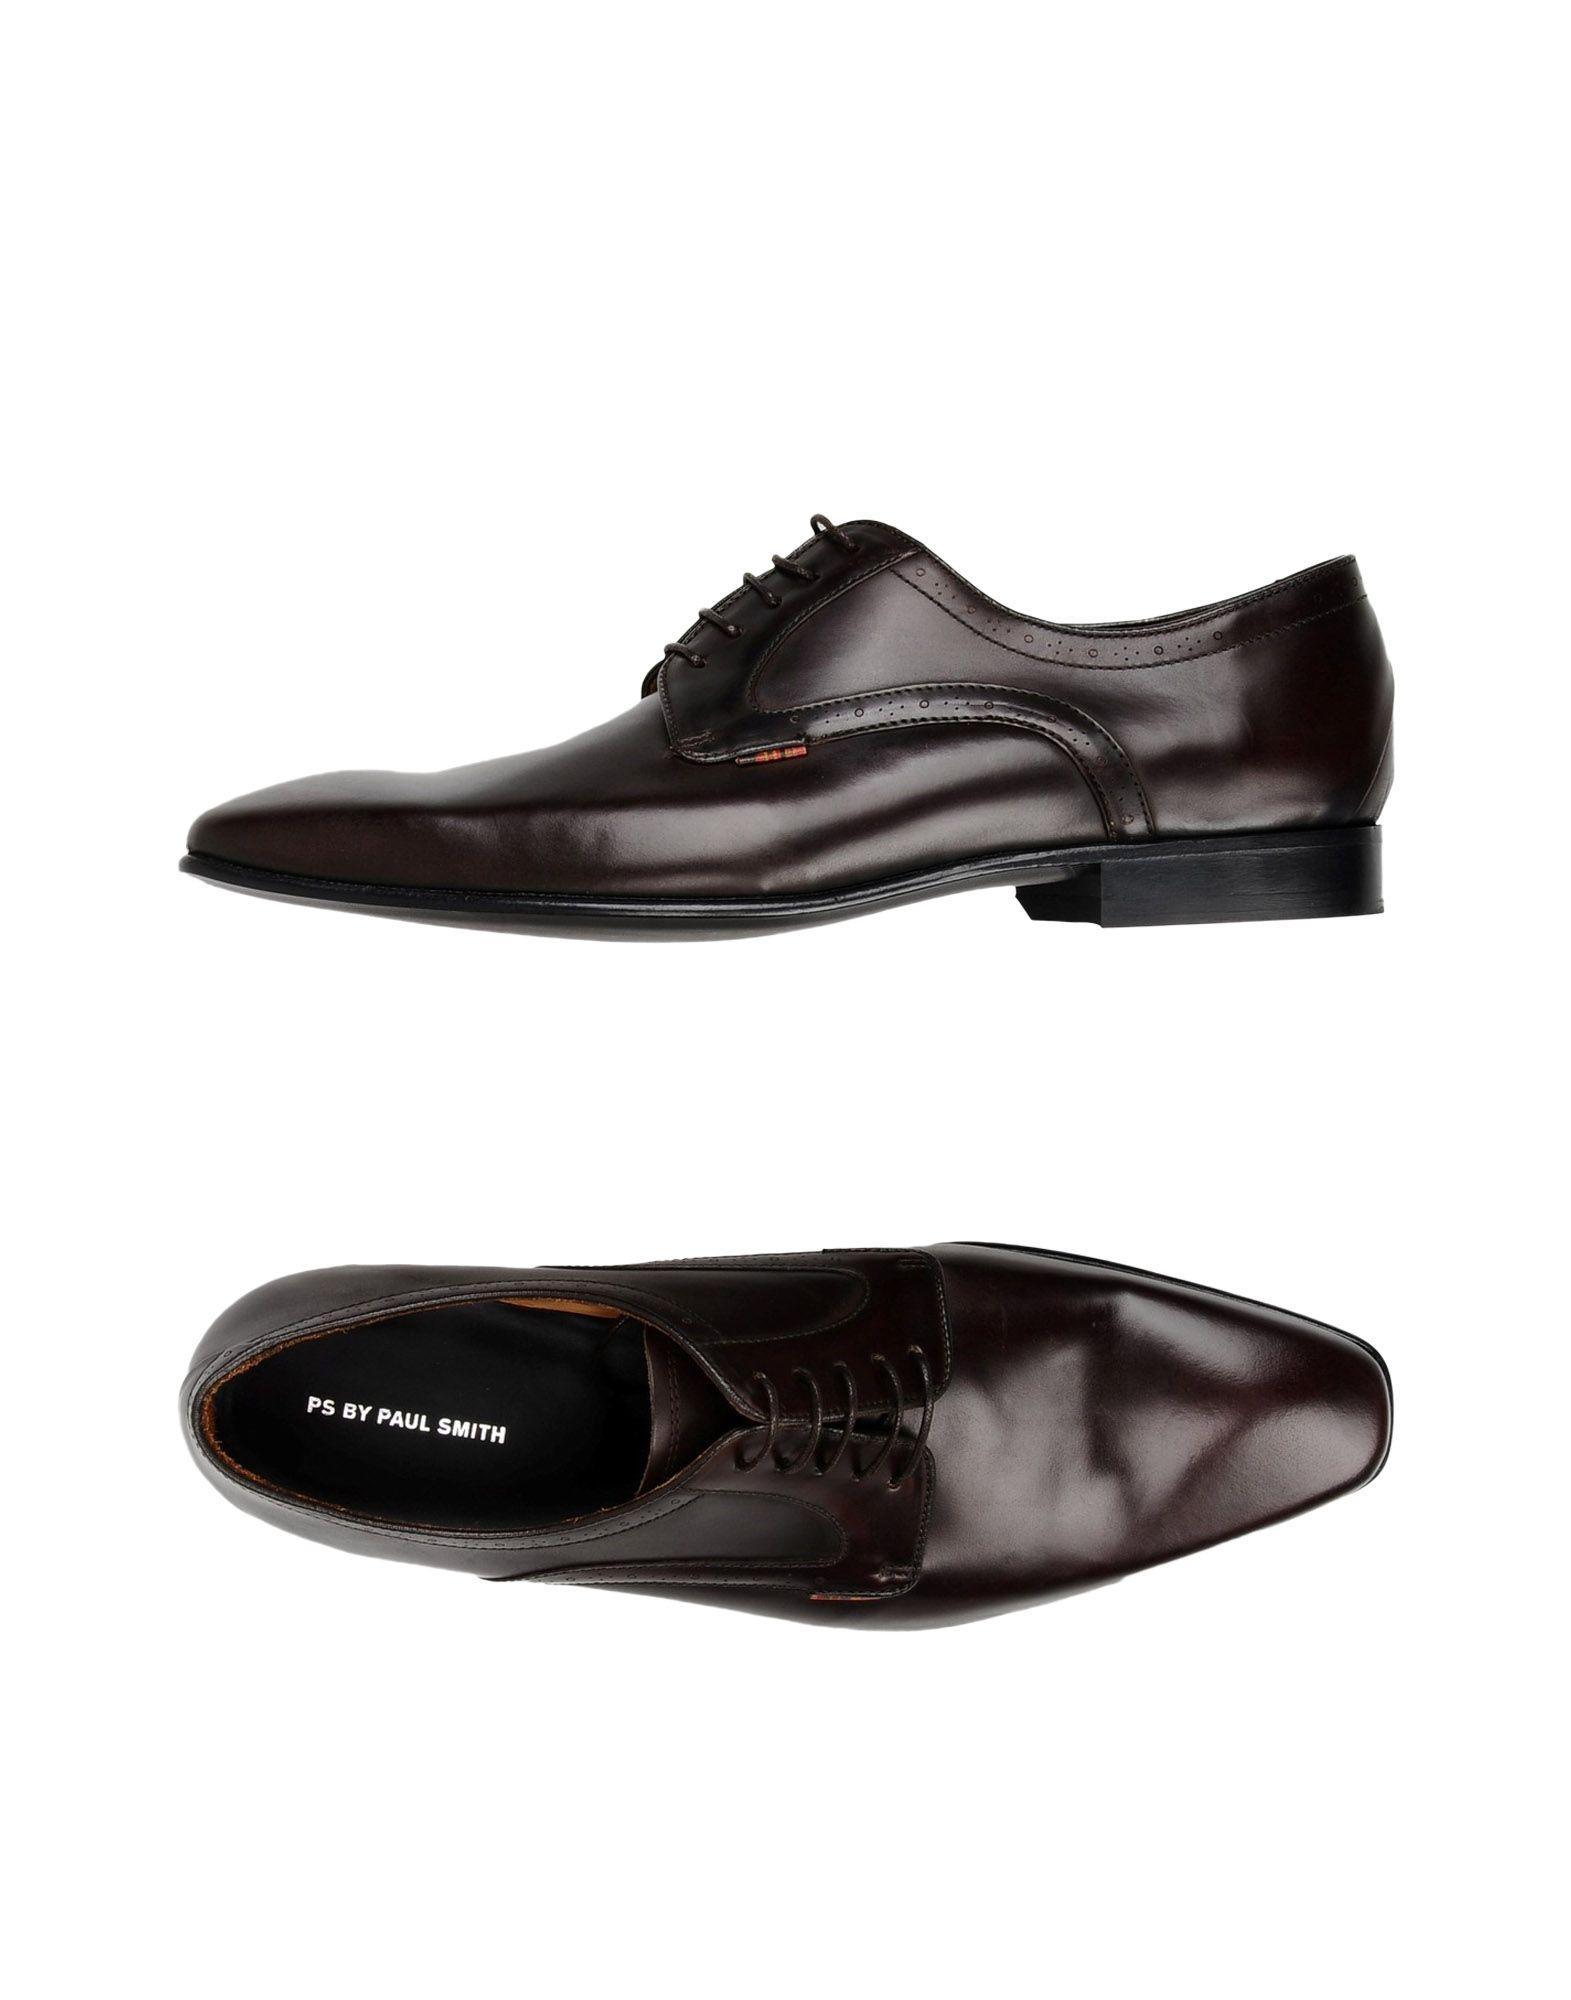 Stringate Ps By Paul Smith Mens Shoe Roth Dark B - Uomo - Acquista online su